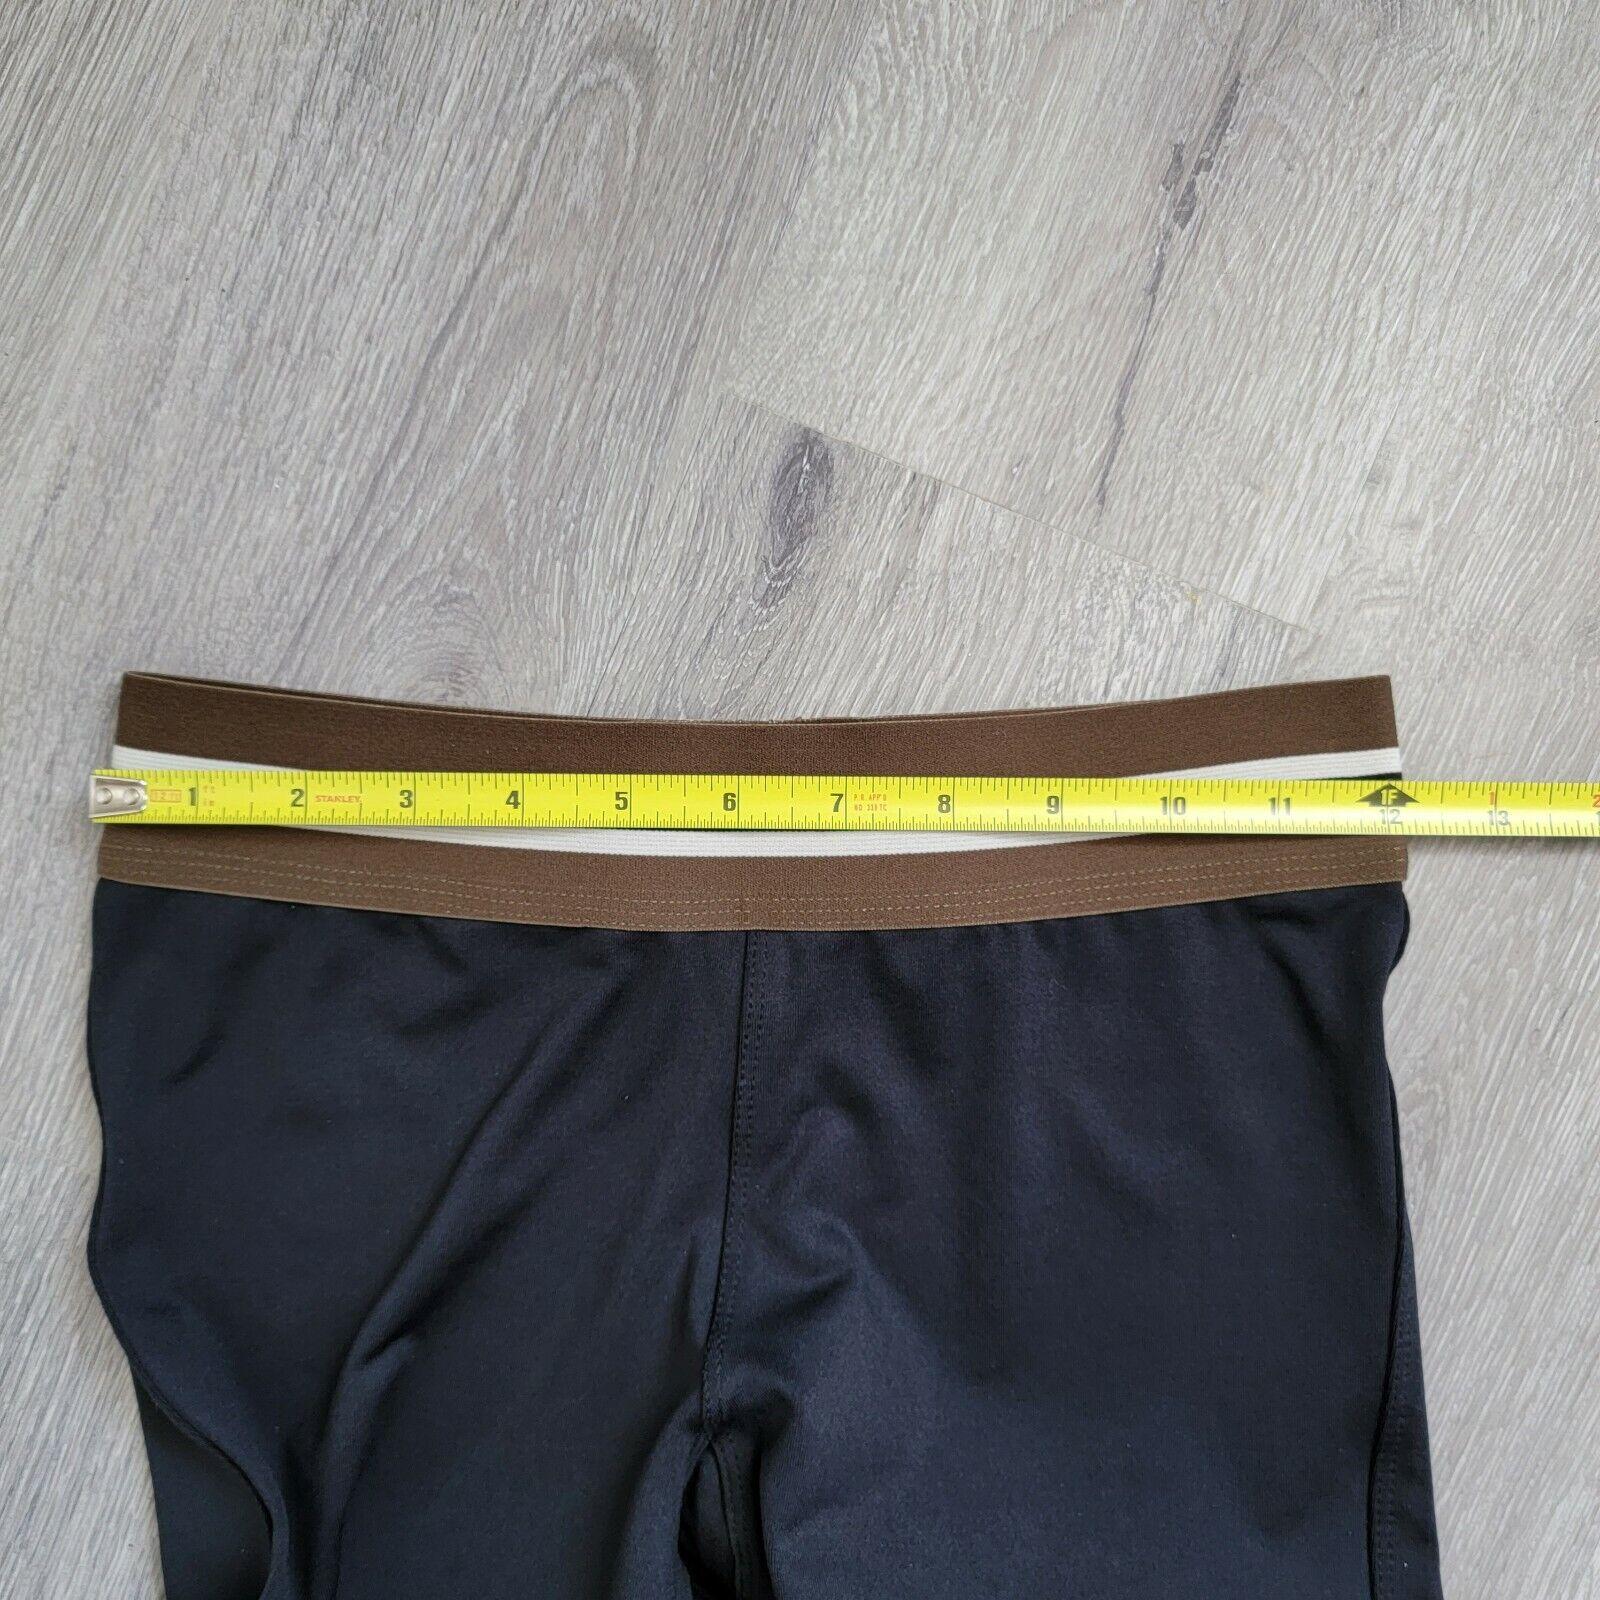 Olympia Activewear AJAX Full Lenght Black Jet Leg… - image 9